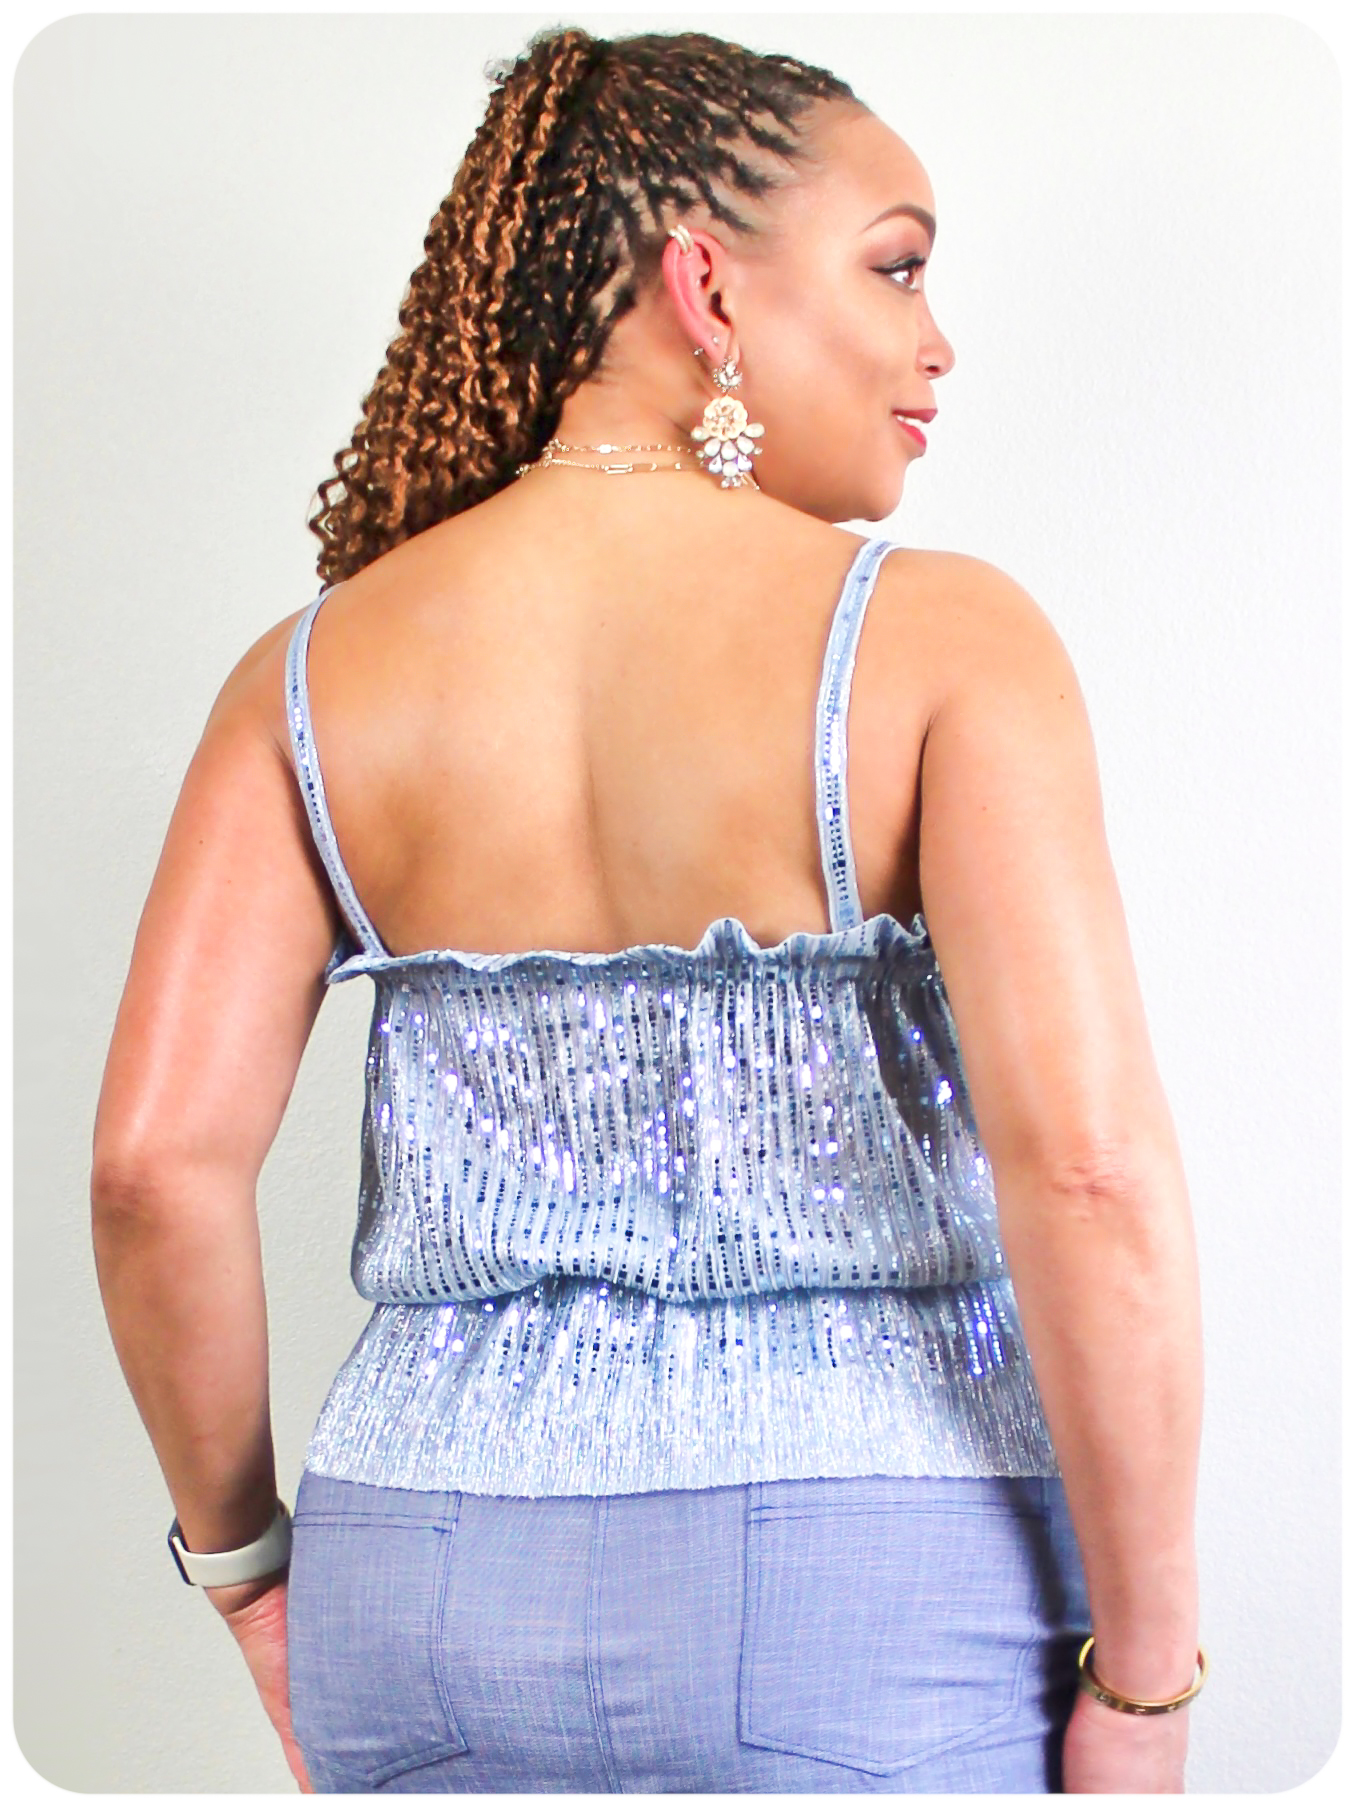 McCall's 8217 Top - Erica Bunker DIY Style x Zelouf Fabrics